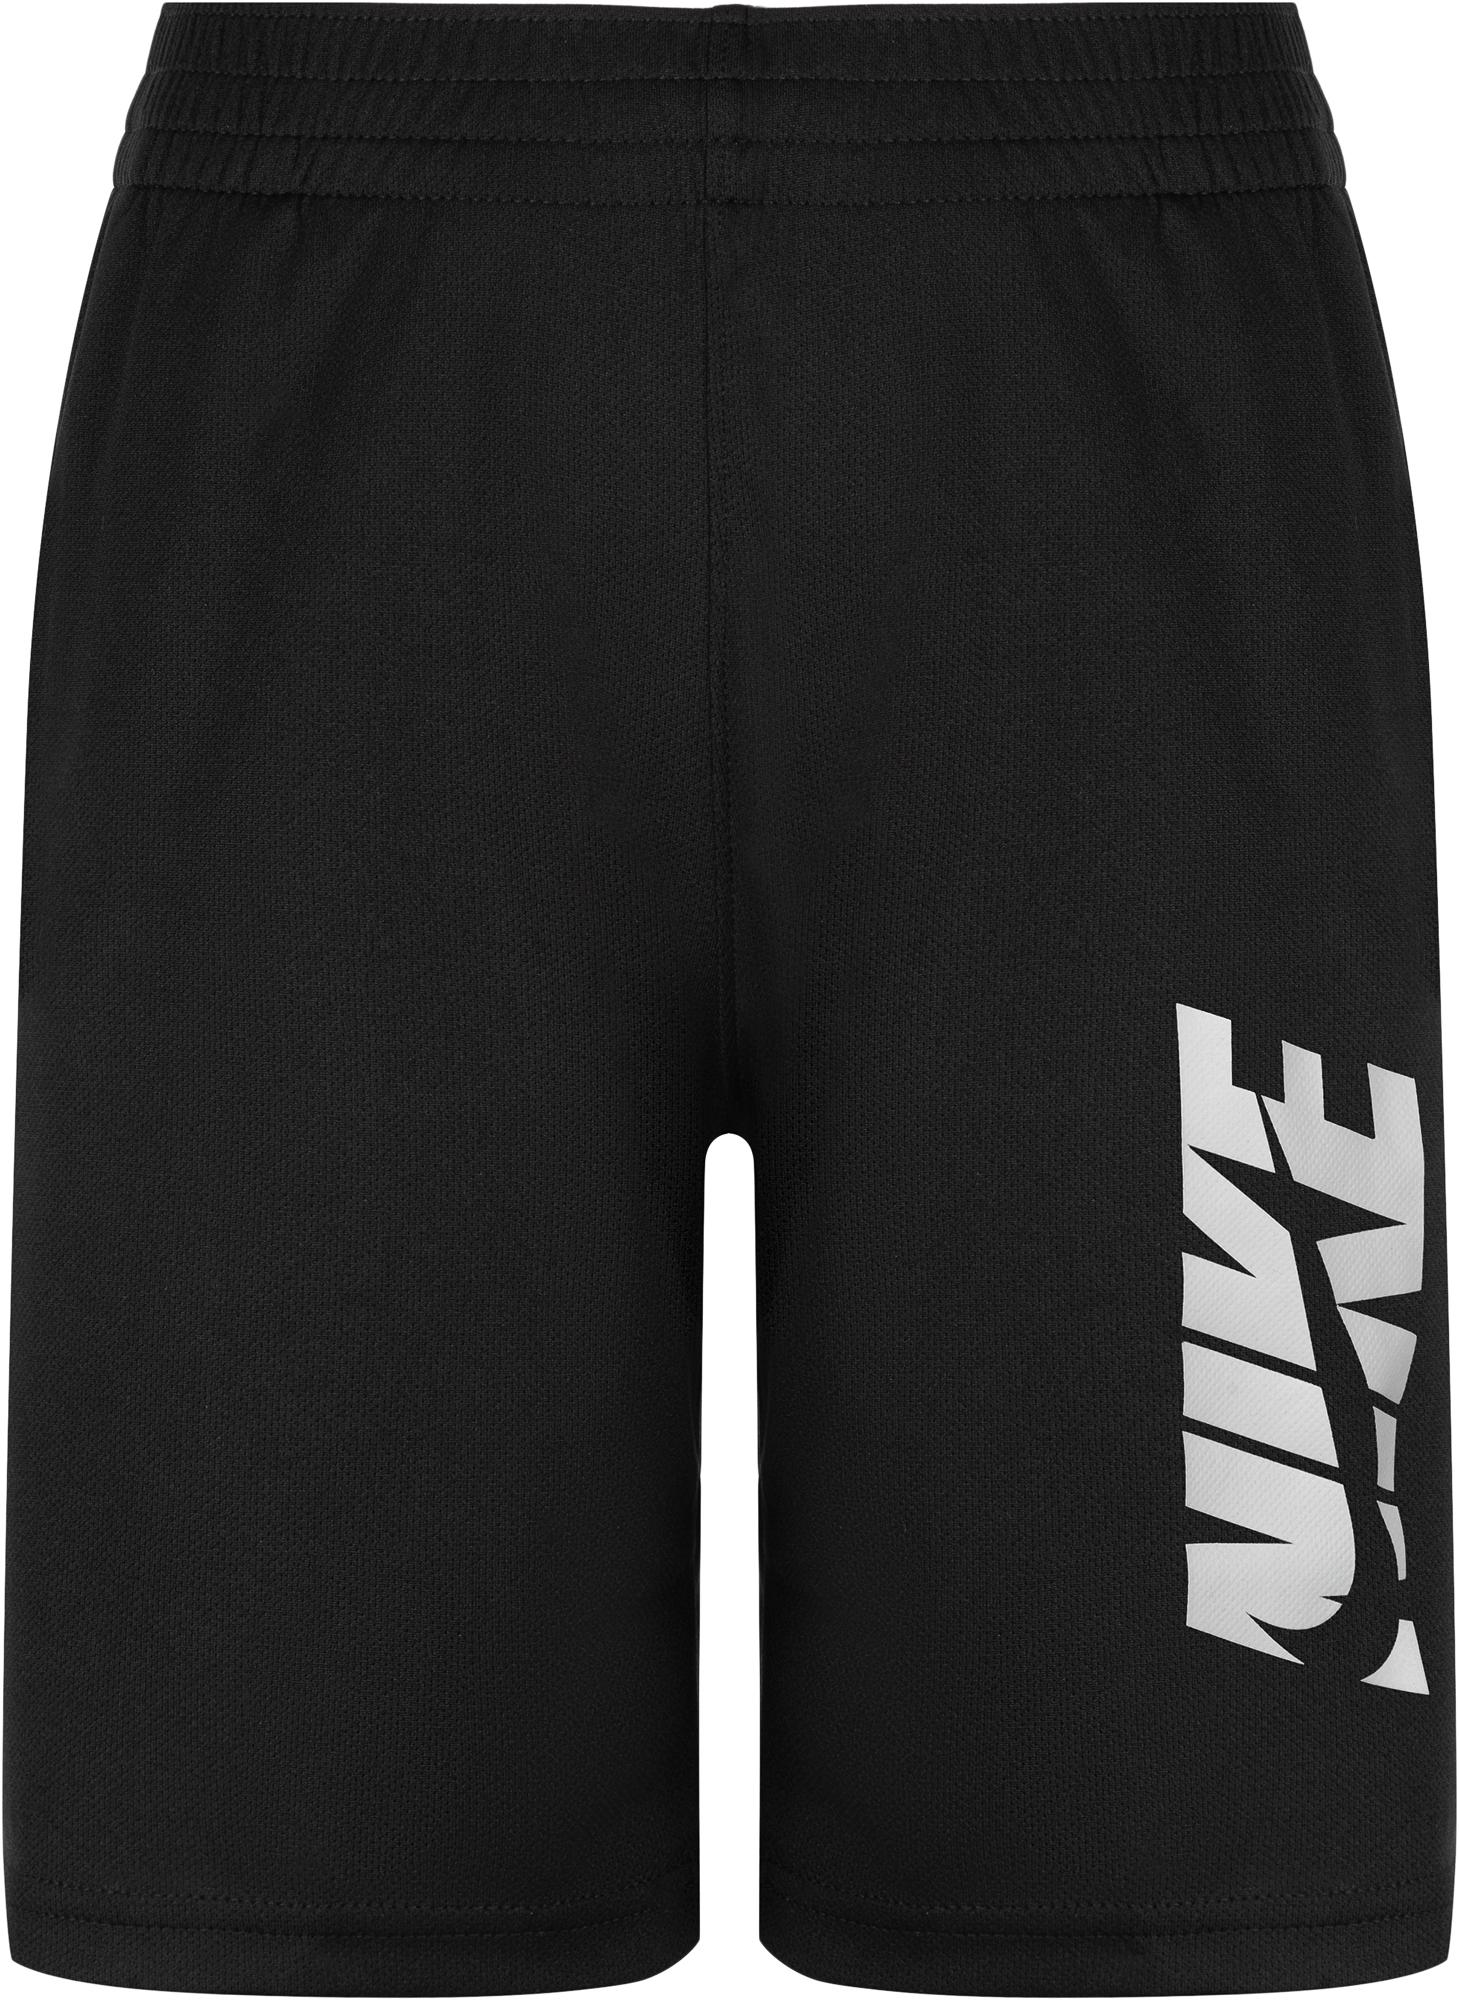 Фото - Nike Шорты для мальчиков Nike, размер 128-137 nike футболка для мальчиков nike dri fit размер 128 137